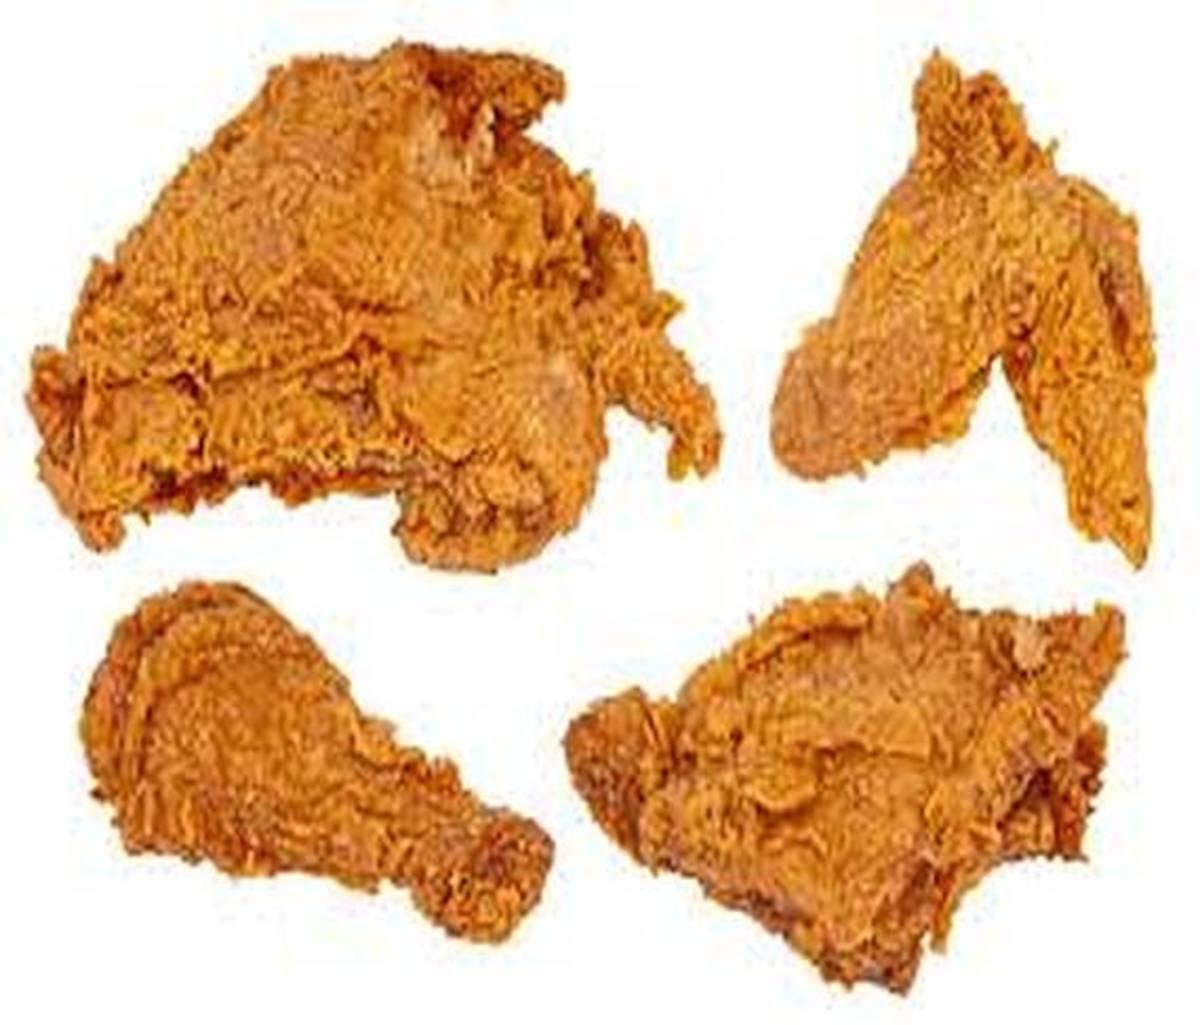 Use cornstarch for extra crispy fried chicken